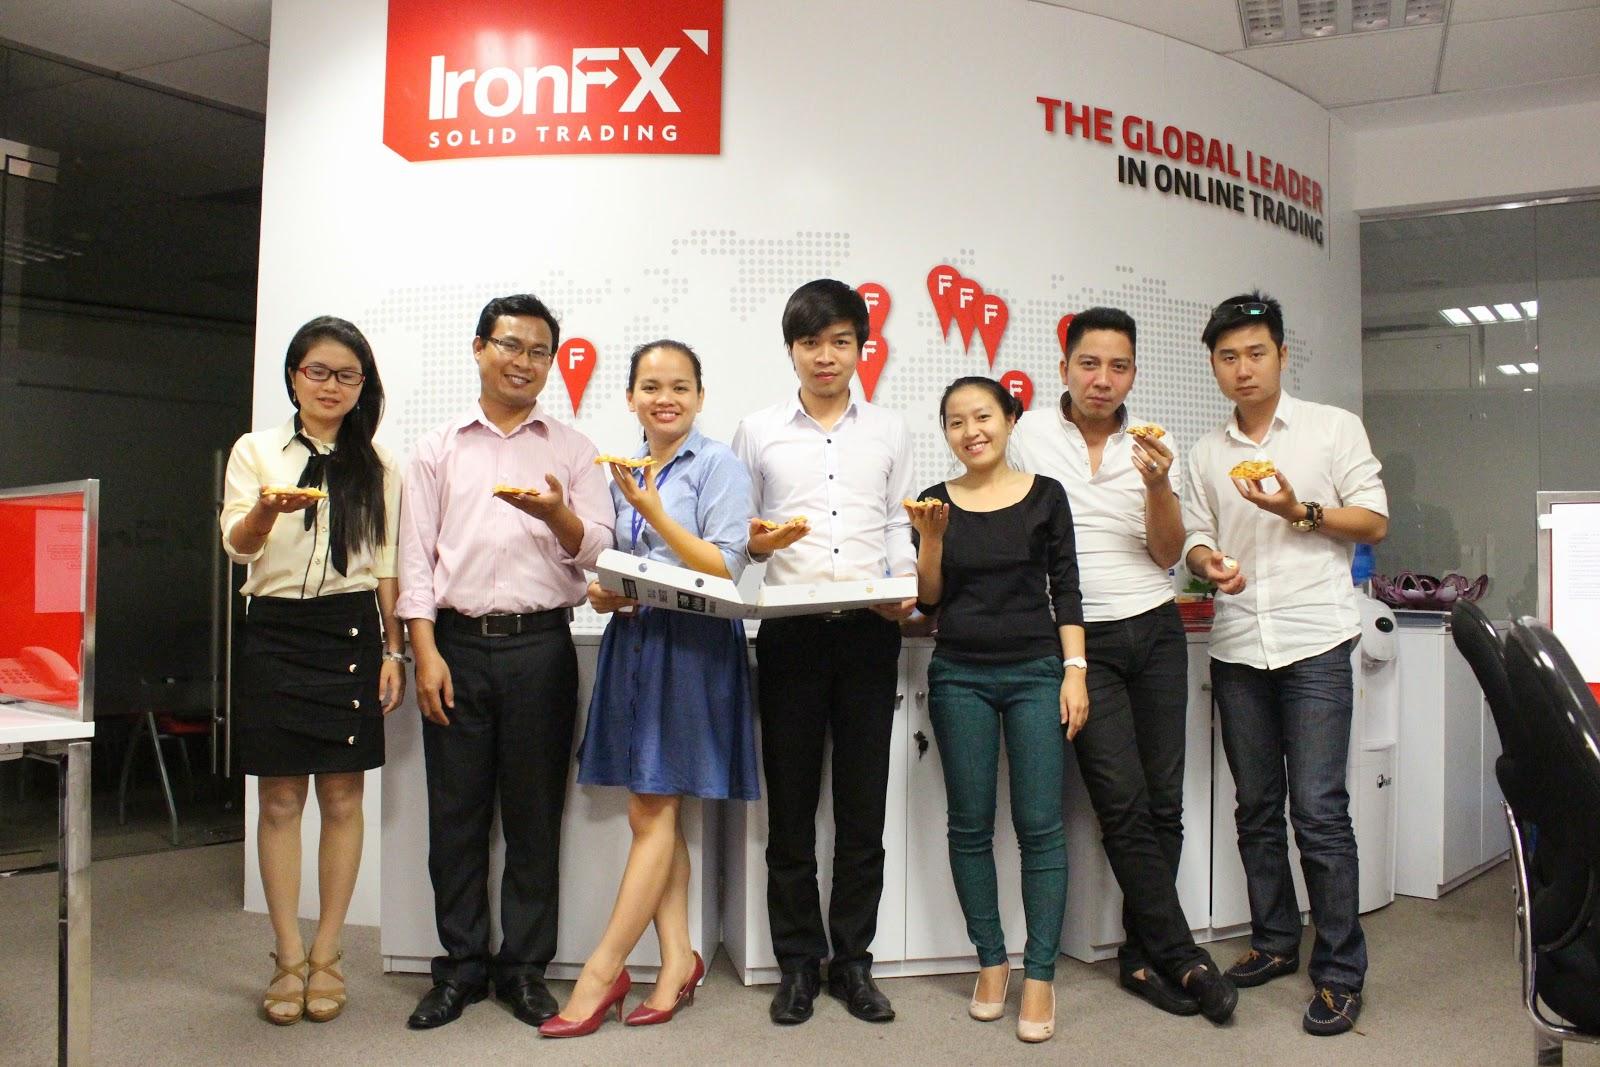 Hội thảo IronFX